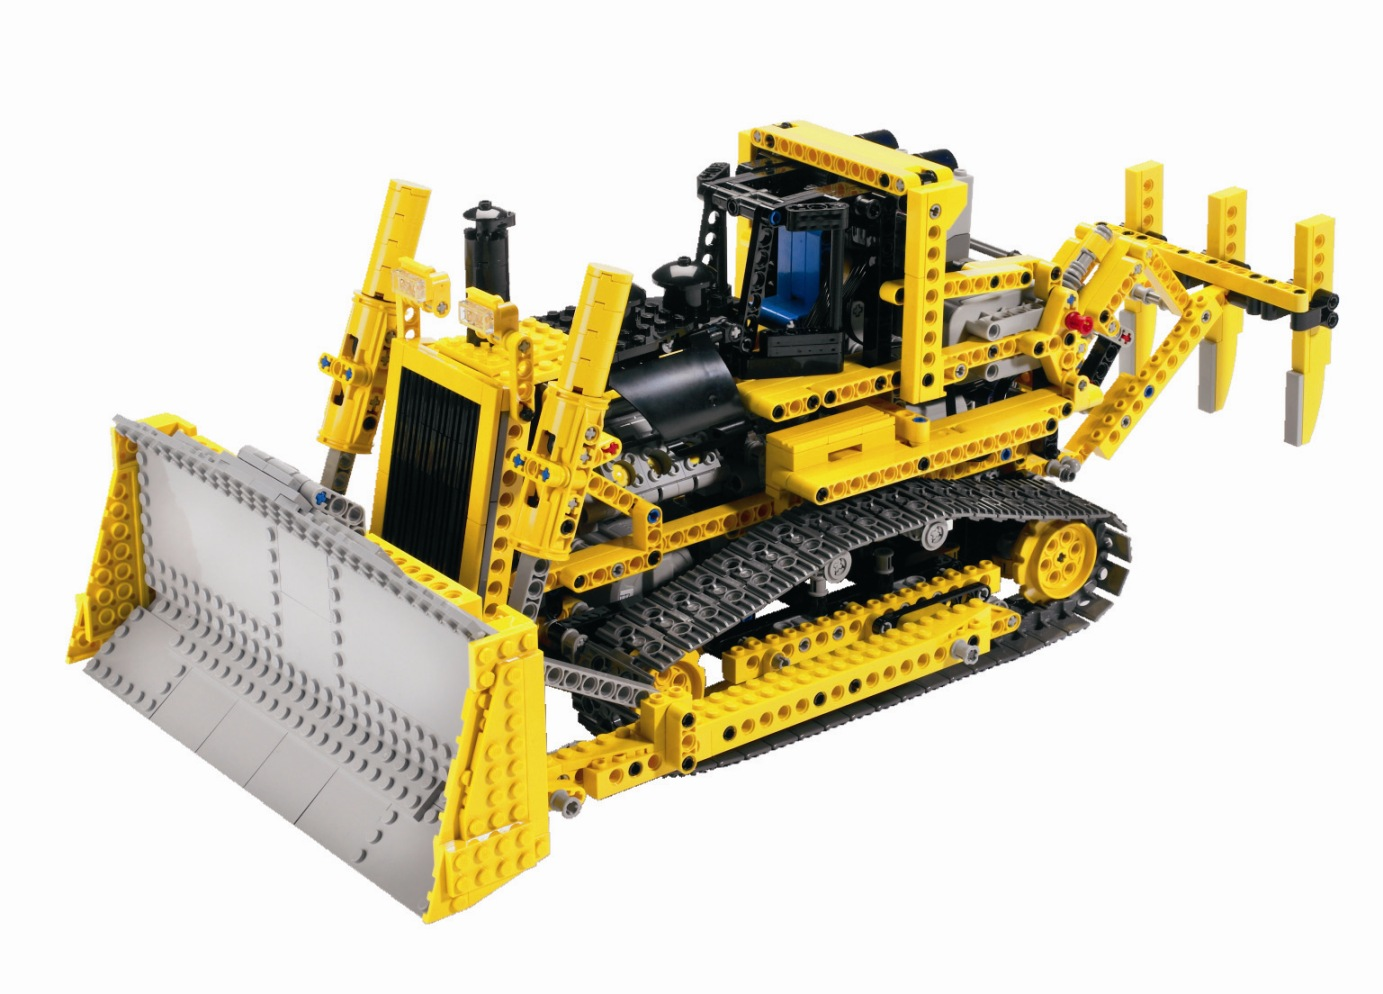 http://4.bp.blogspot.com/_XruxXWCFBLg/TRy7raz1_yI/AAAAAAAAAbQ/yW8UwdYPuEE/s1600/lego_technic_remote_control_motorised_bulldozer.jpg